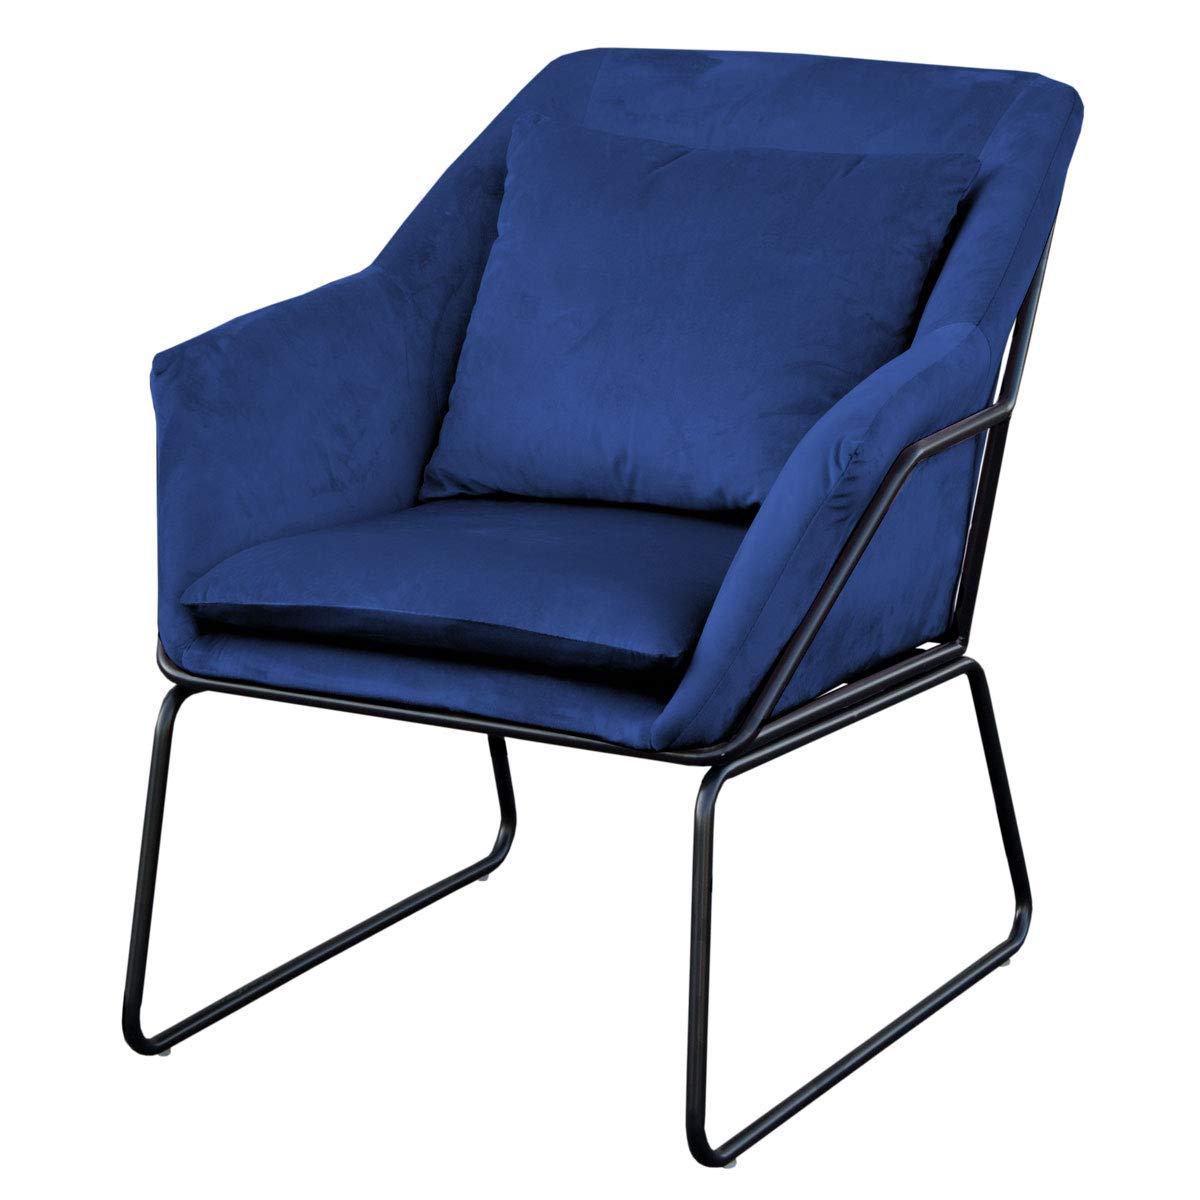 SVITA Sessel gepolstert Beistellsessel Lounge Couch Einzelsofa Relaxsessel Seat Fernsehsessel Stoff inkl. Kissen Stuhl Samt (Blau, Samt)